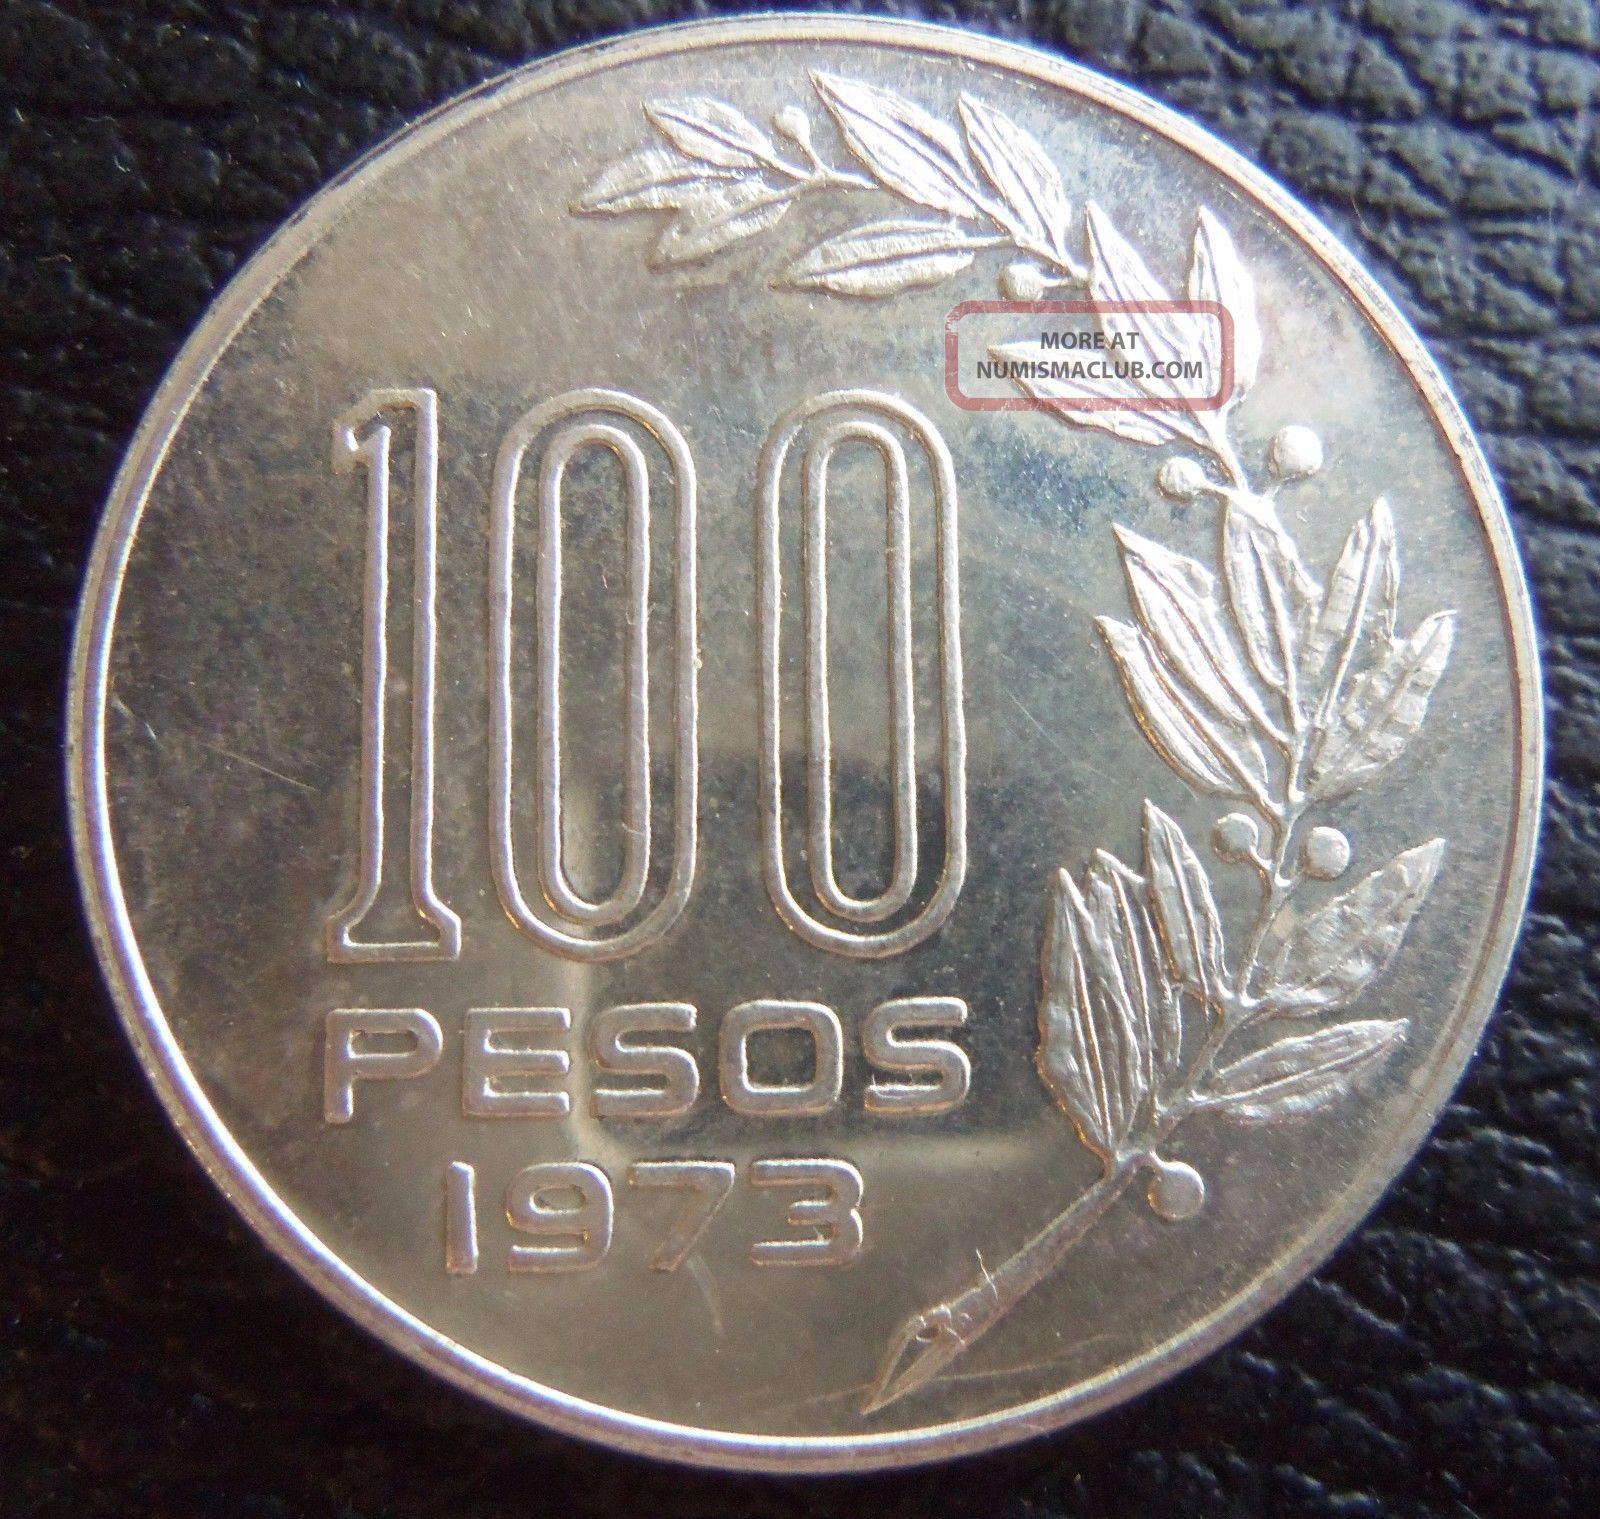 Uruguay 1973 Silver Essay 100 Pesos Coin South America photo